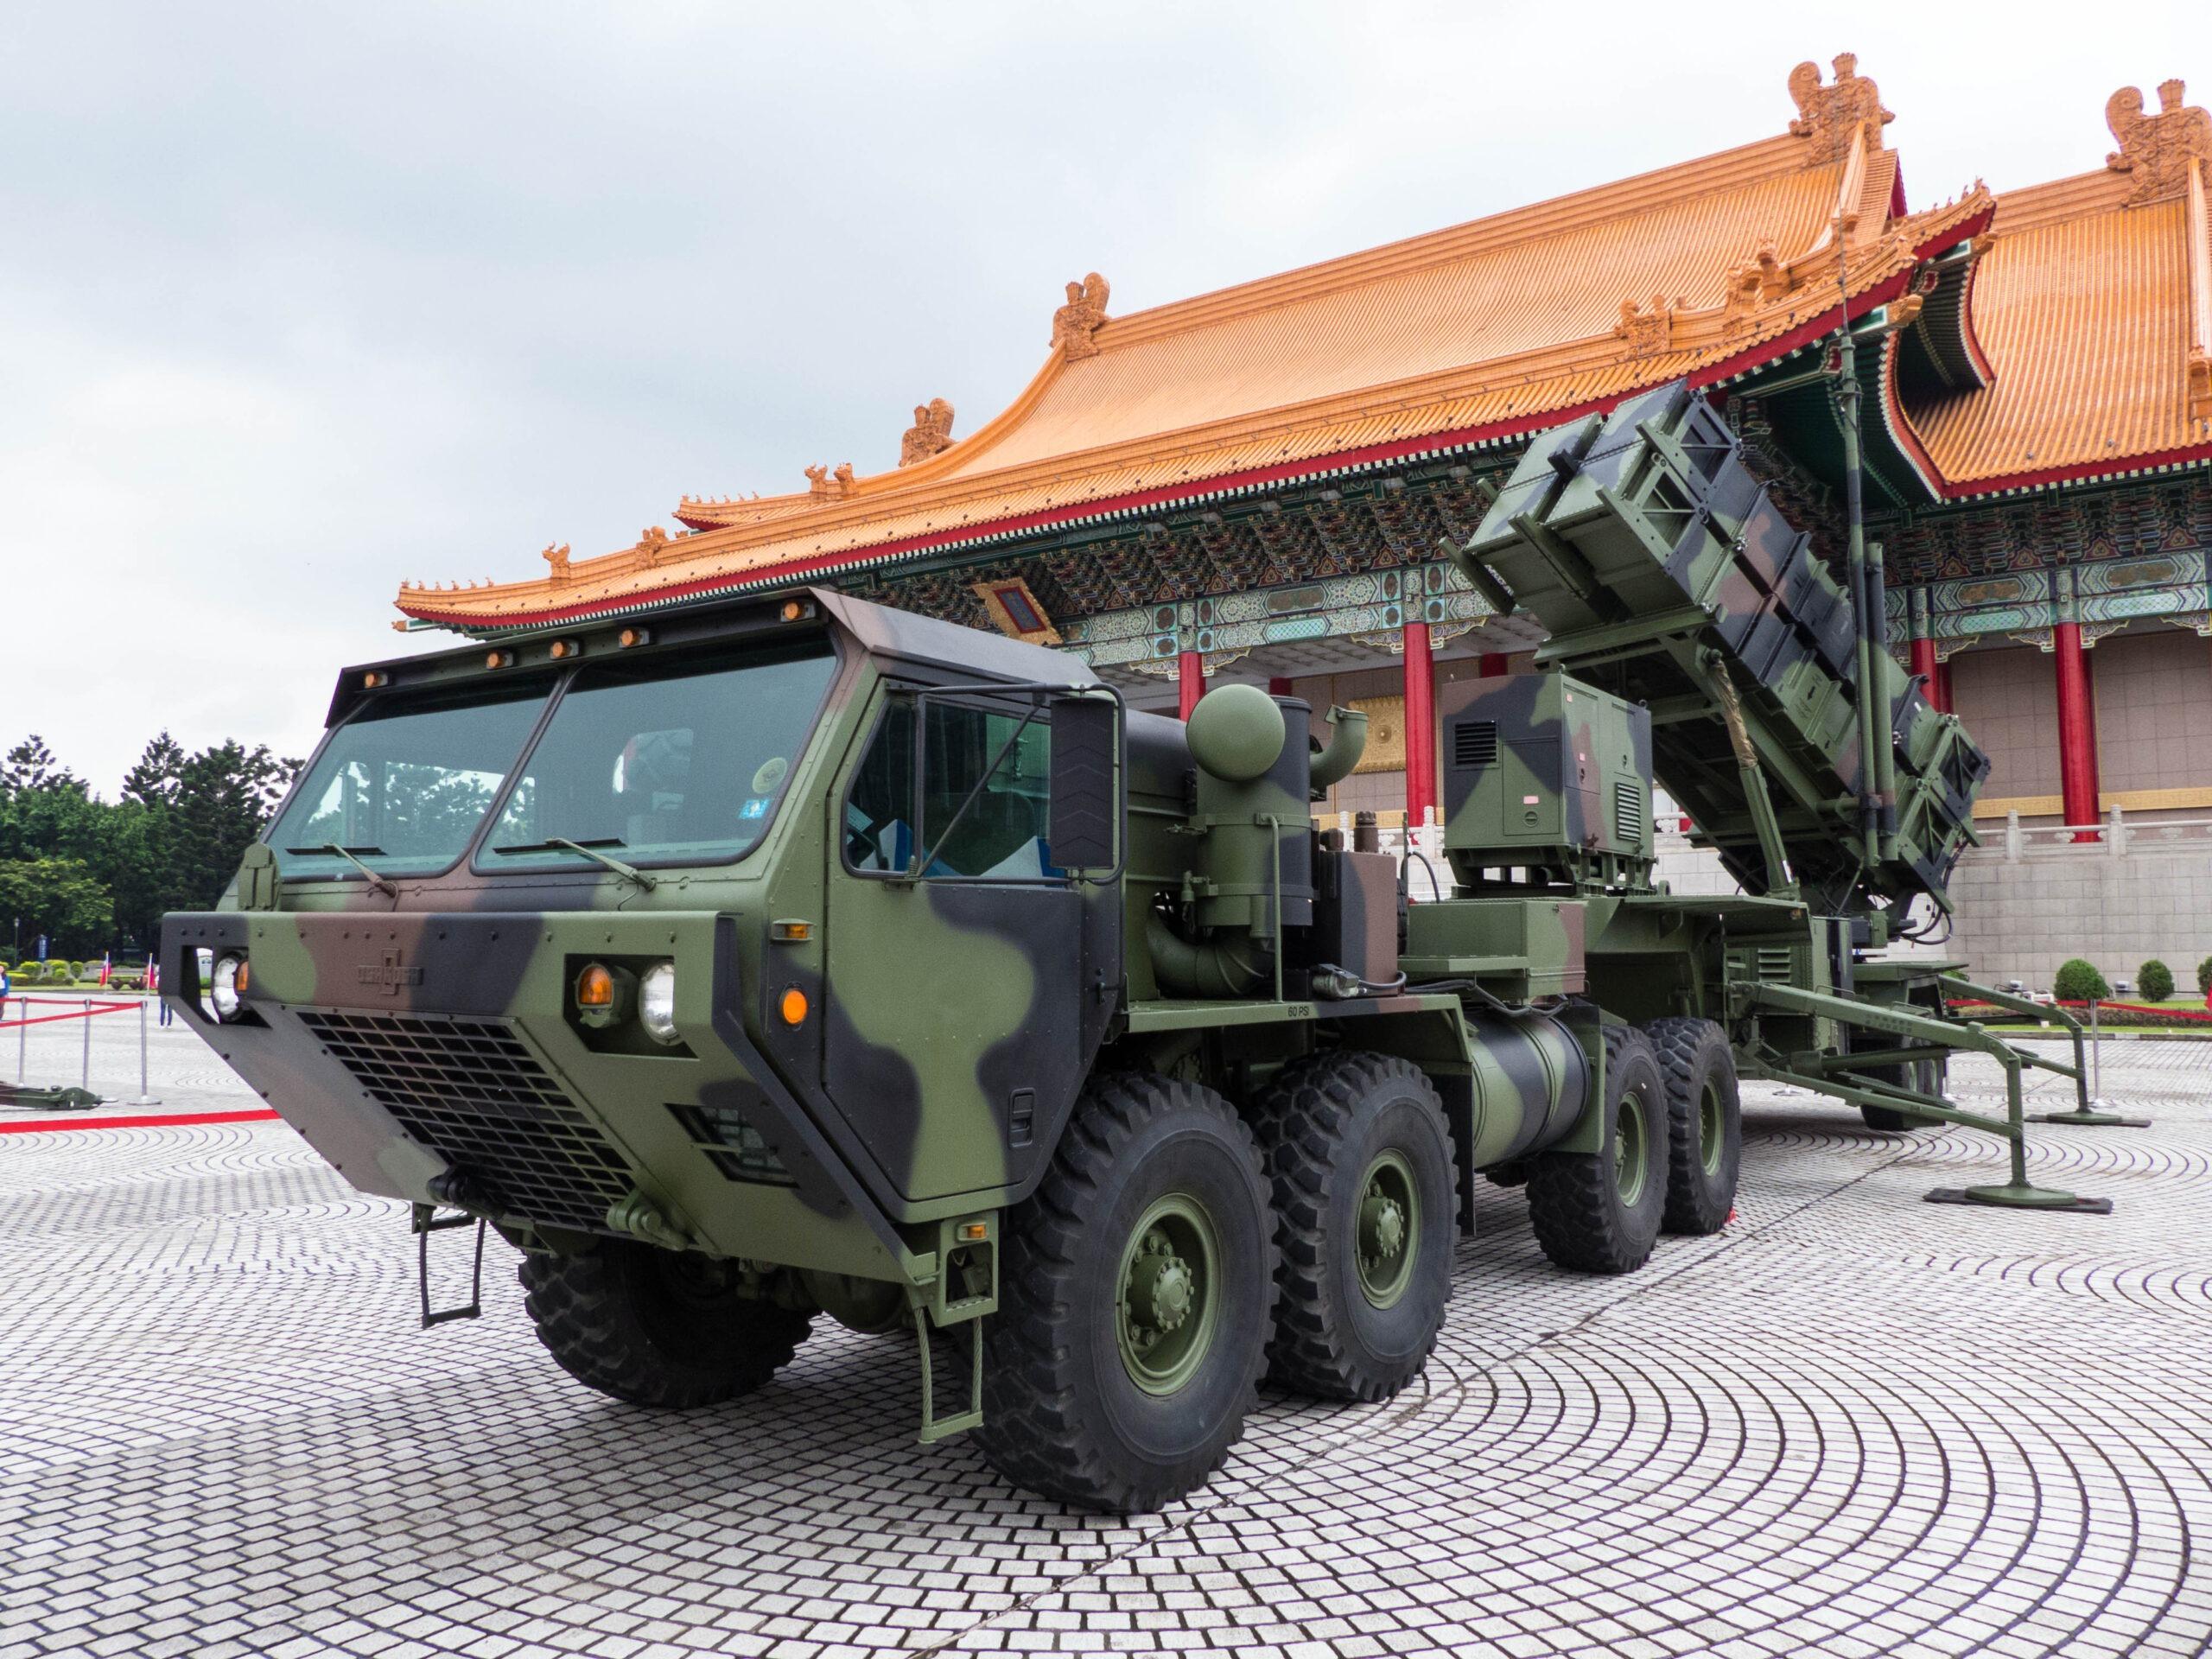 PAC-3 Hava Savunma Sistemi